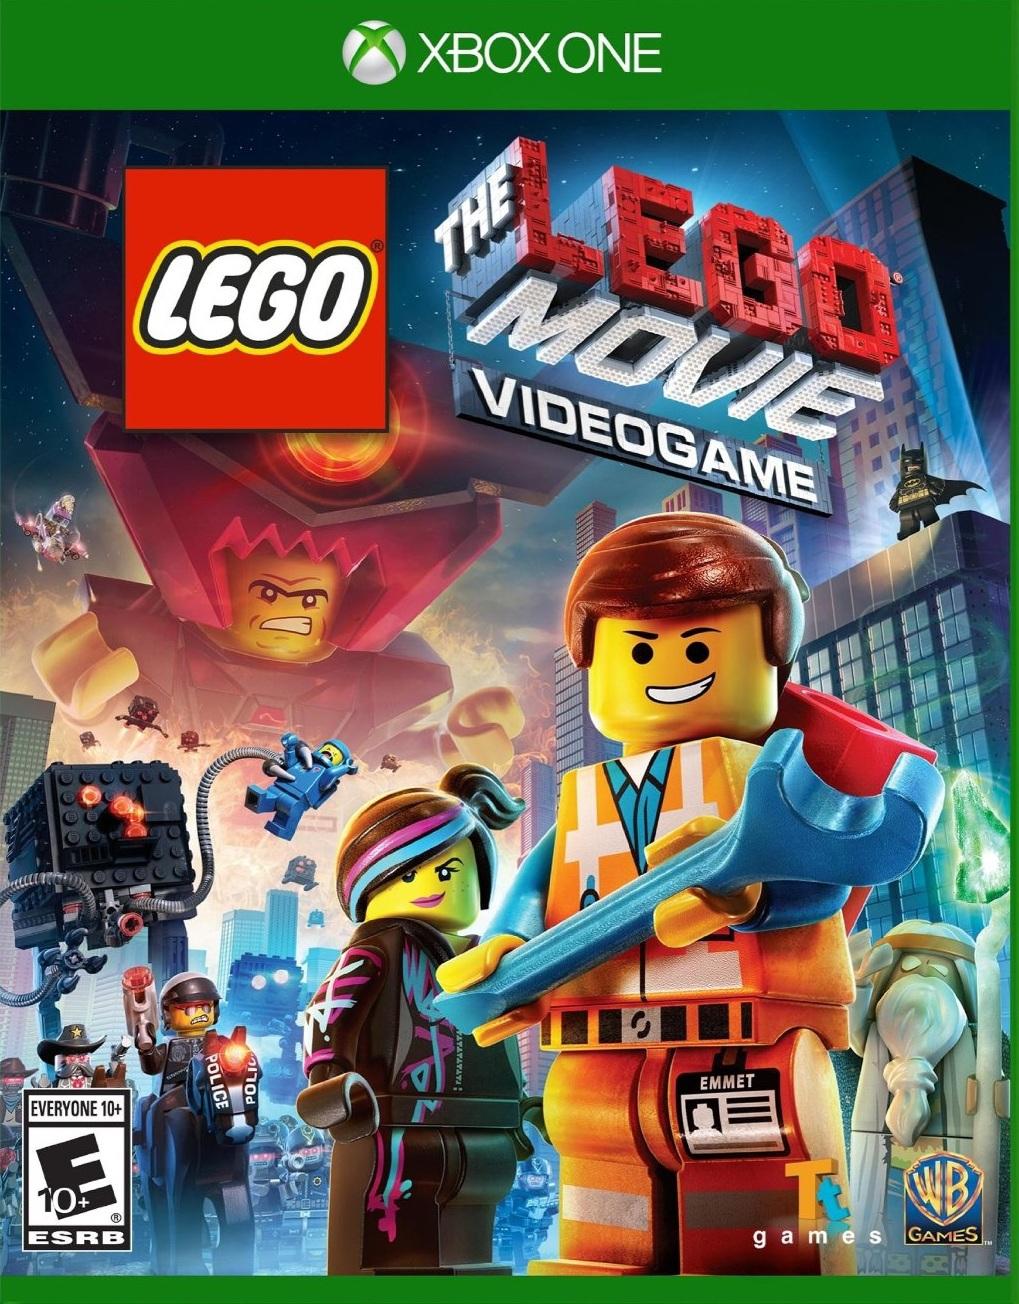 The Lego Movie Videogame Video Game 2014 Imdb